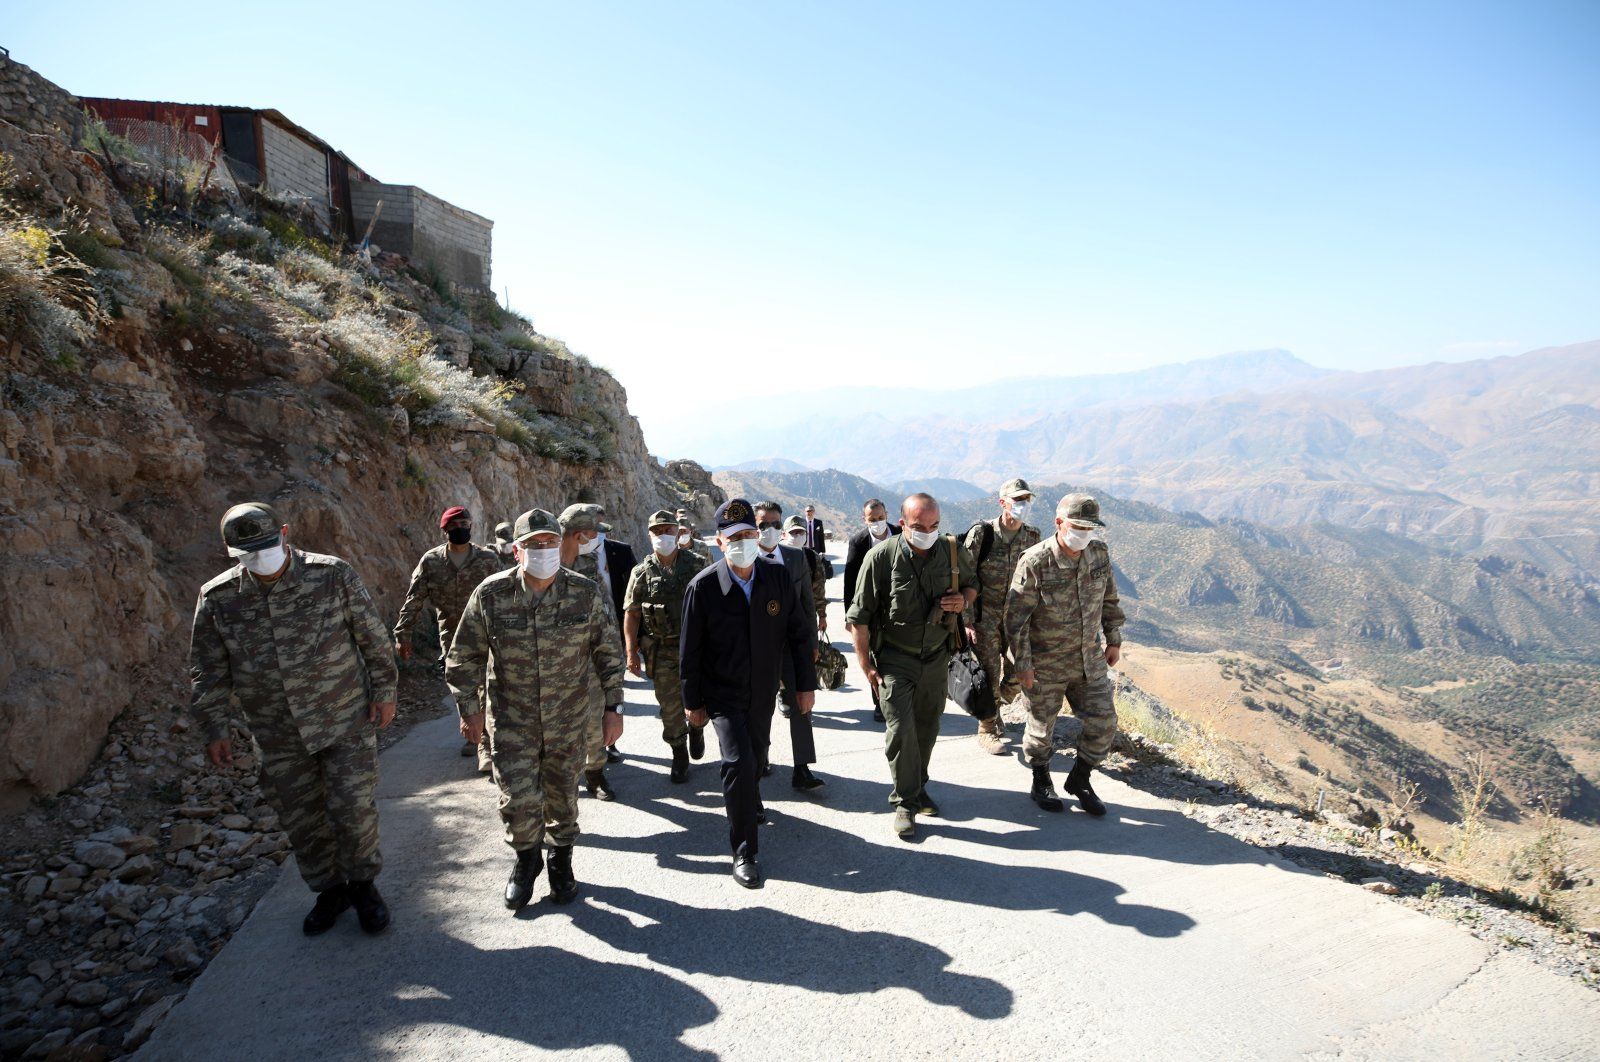 Defense Minister Hulusi Akar inspects the border troops in Turkey's southeastern Şırnak province with Chief of General Staff Gen. Yaşar Güler and Land Forces Commander Gen. Ümit Dündar, Aug. 9, 2020. (AA Photo)